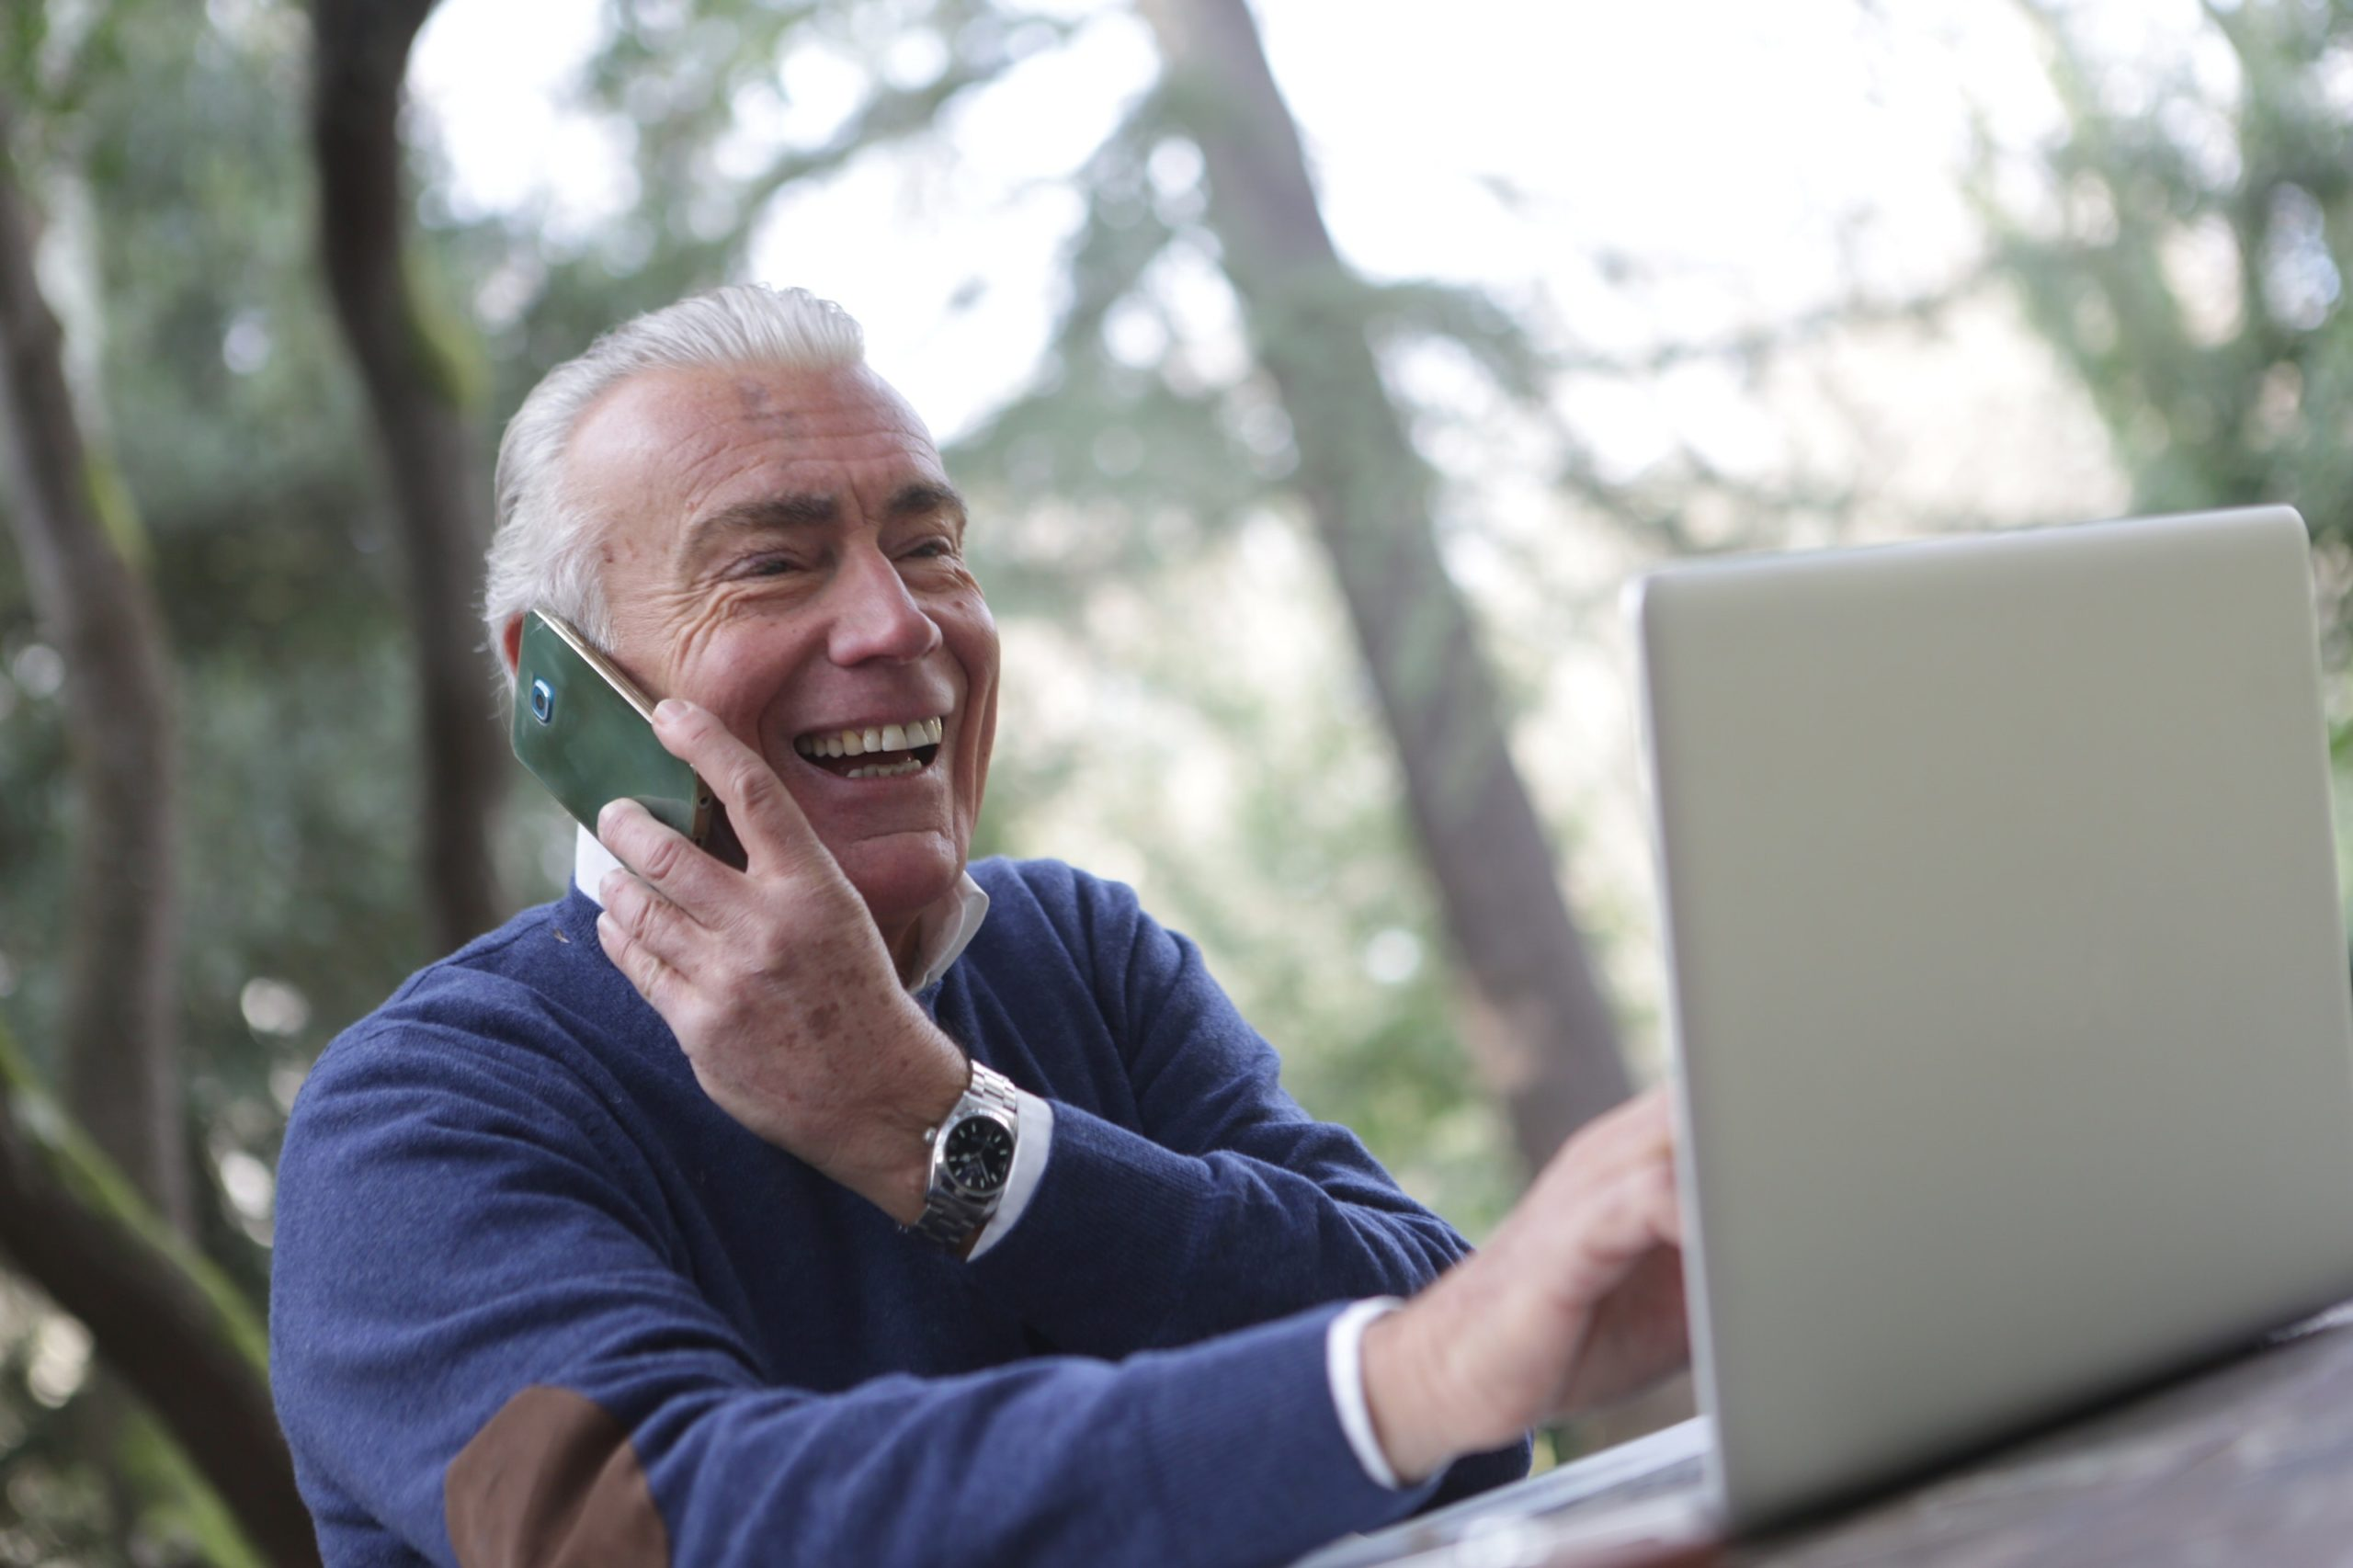 Nobiletin may prevent the development of Alzheimer's disease and Dementia